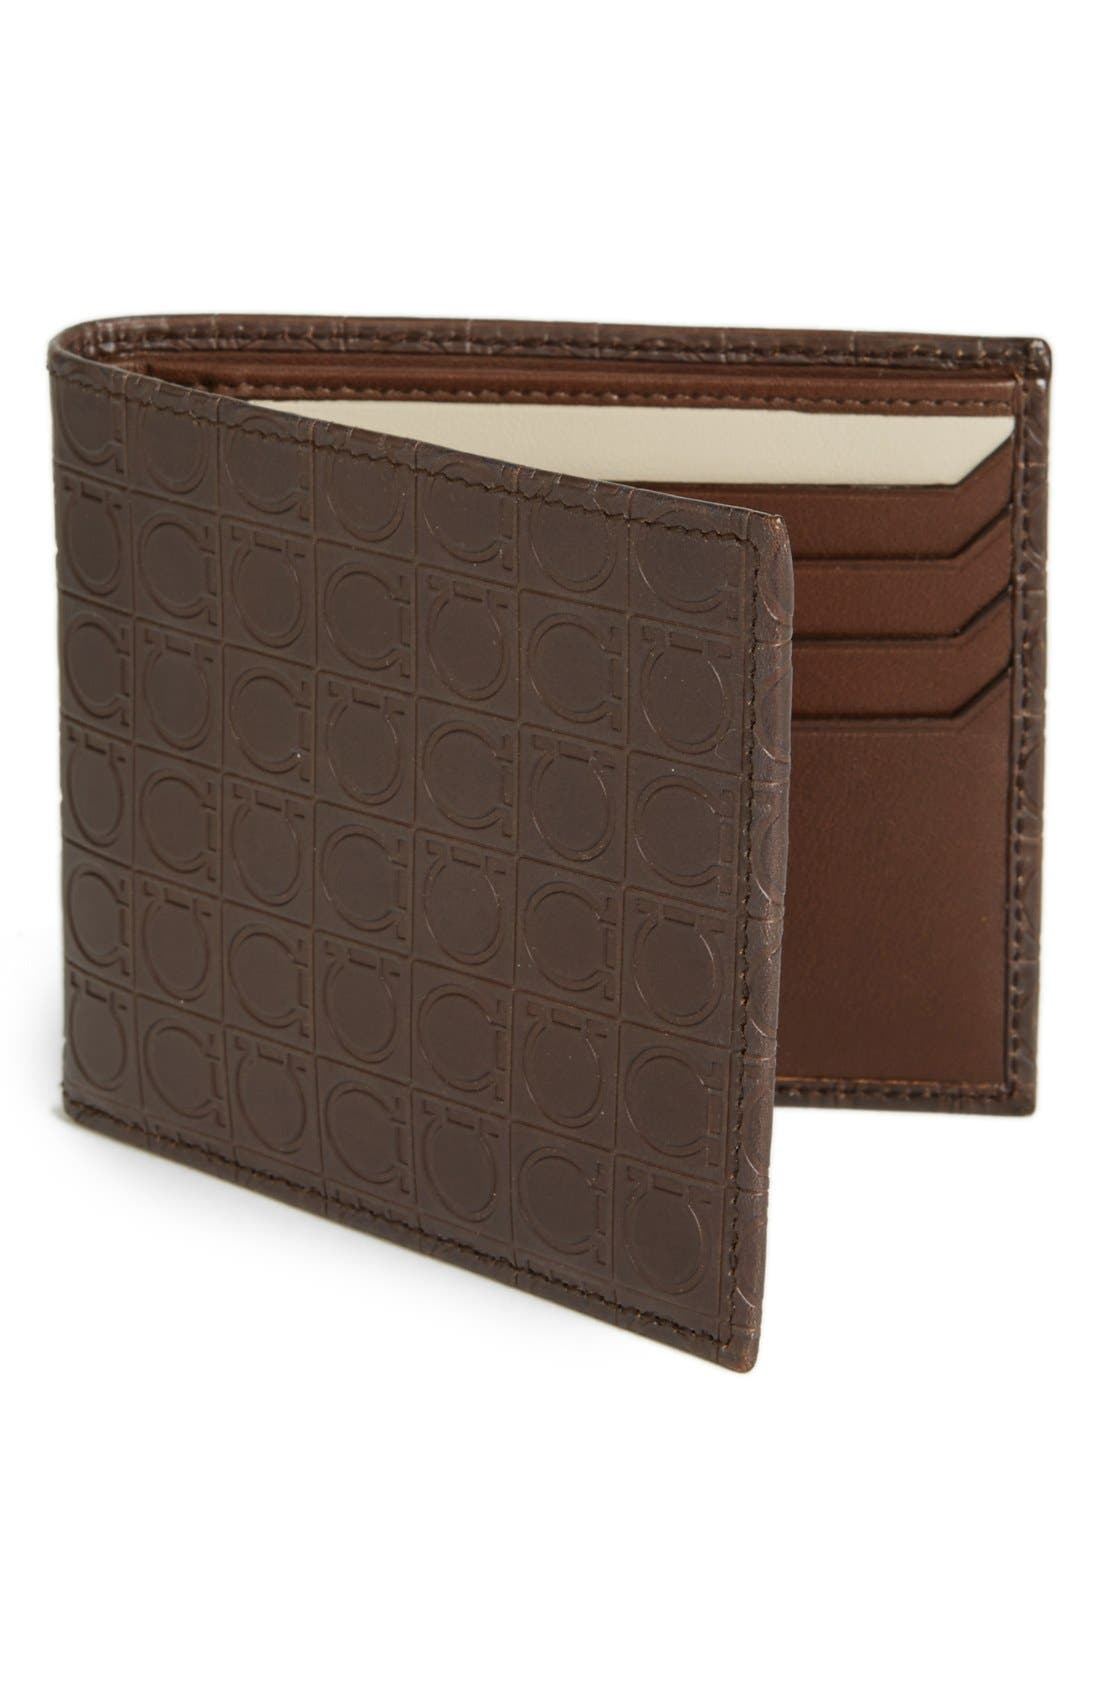 Alternate Image 1 Selected - Salvatore Ferragamo Leather Wallet